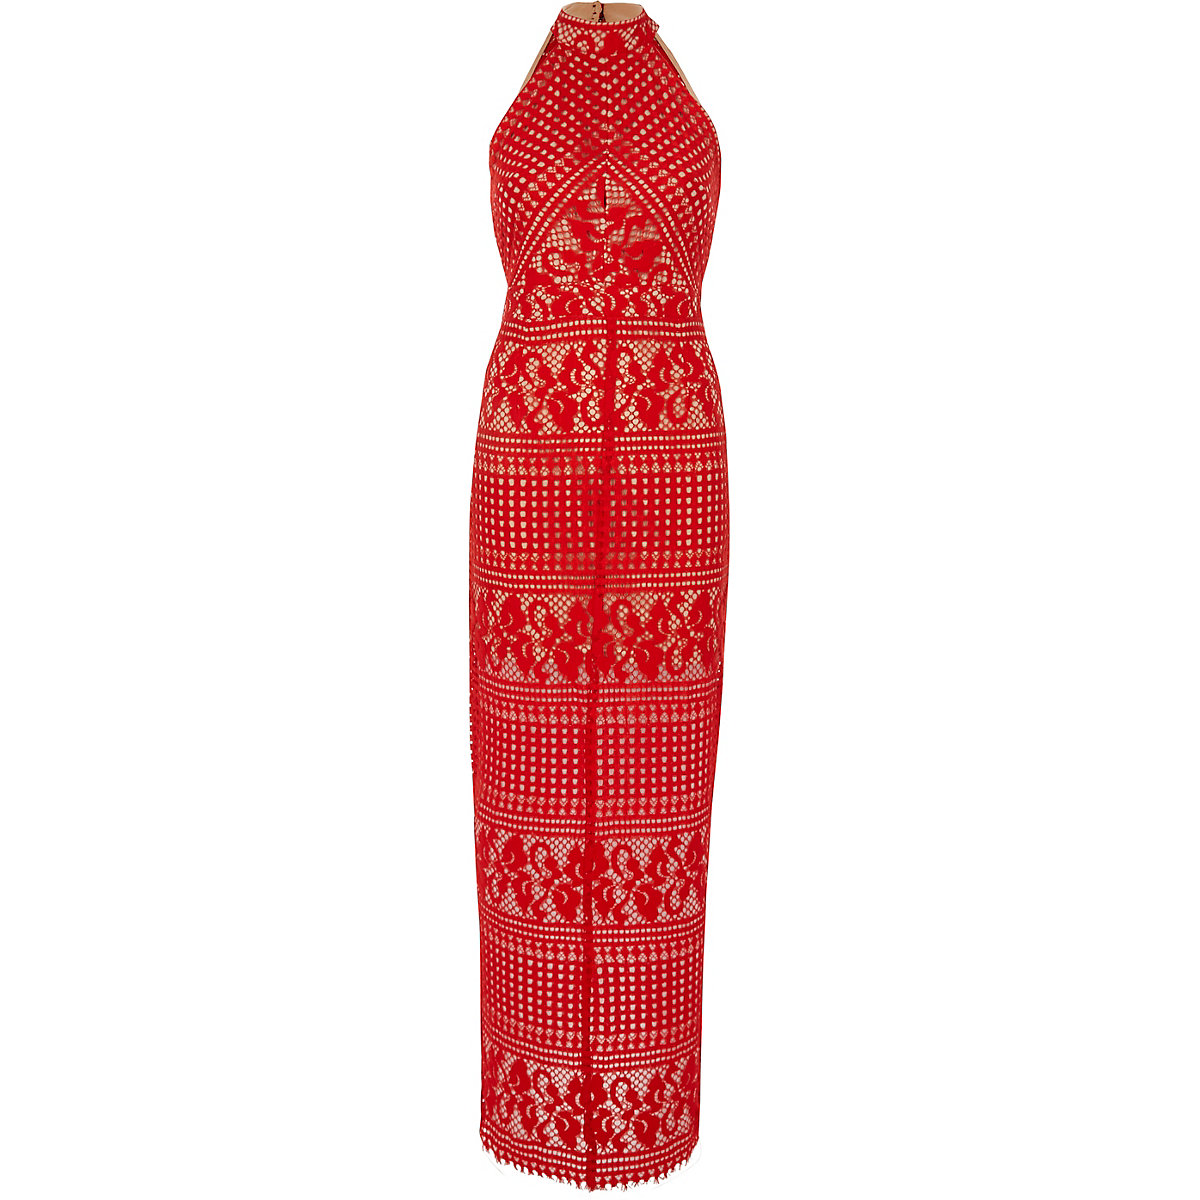 Red lace sleeveless maxi dress